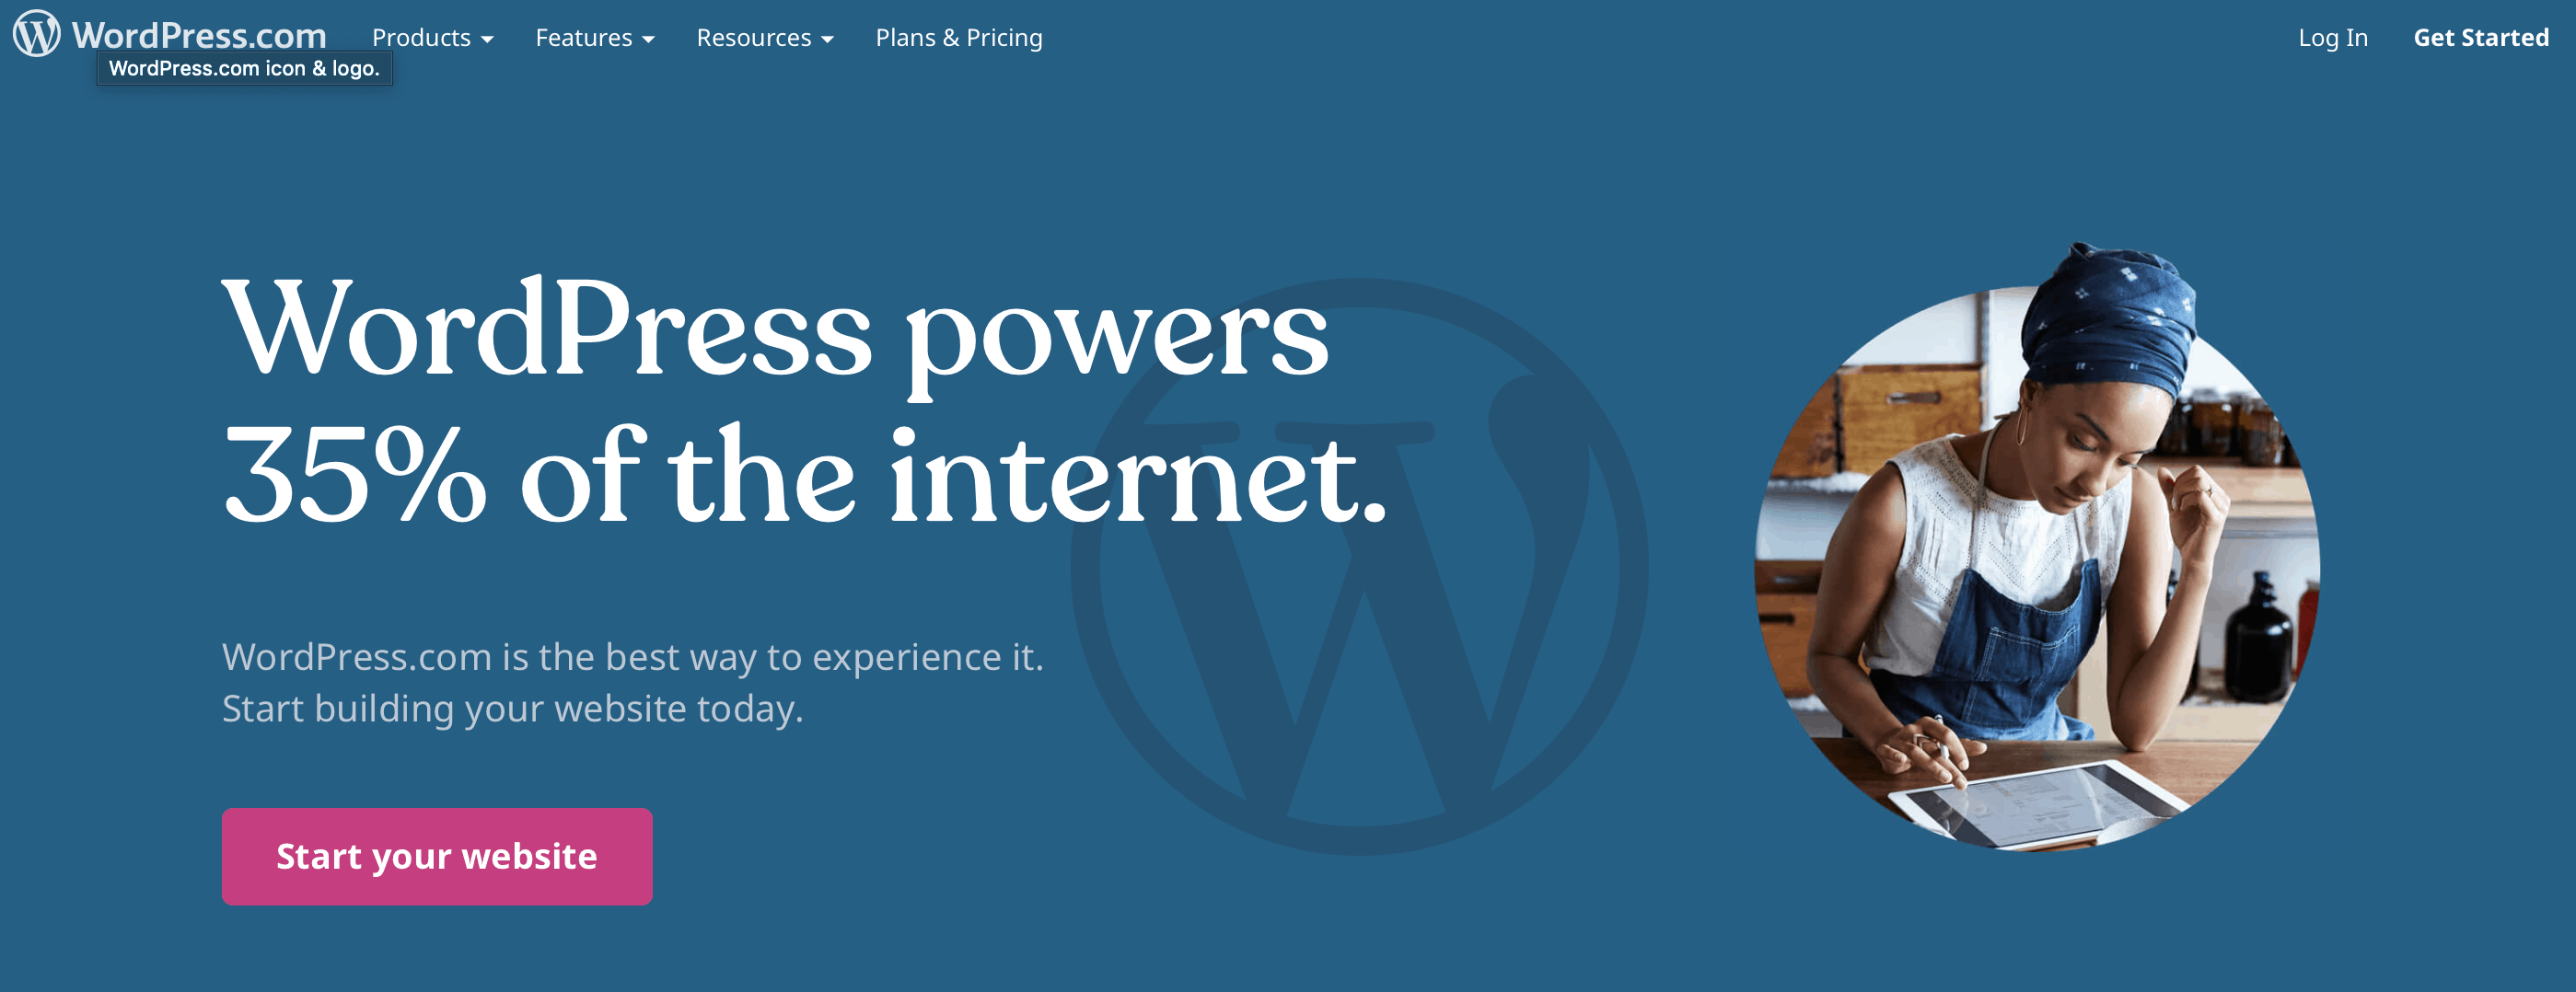 self hosted wordpress vs wordpress.com wordpress.com